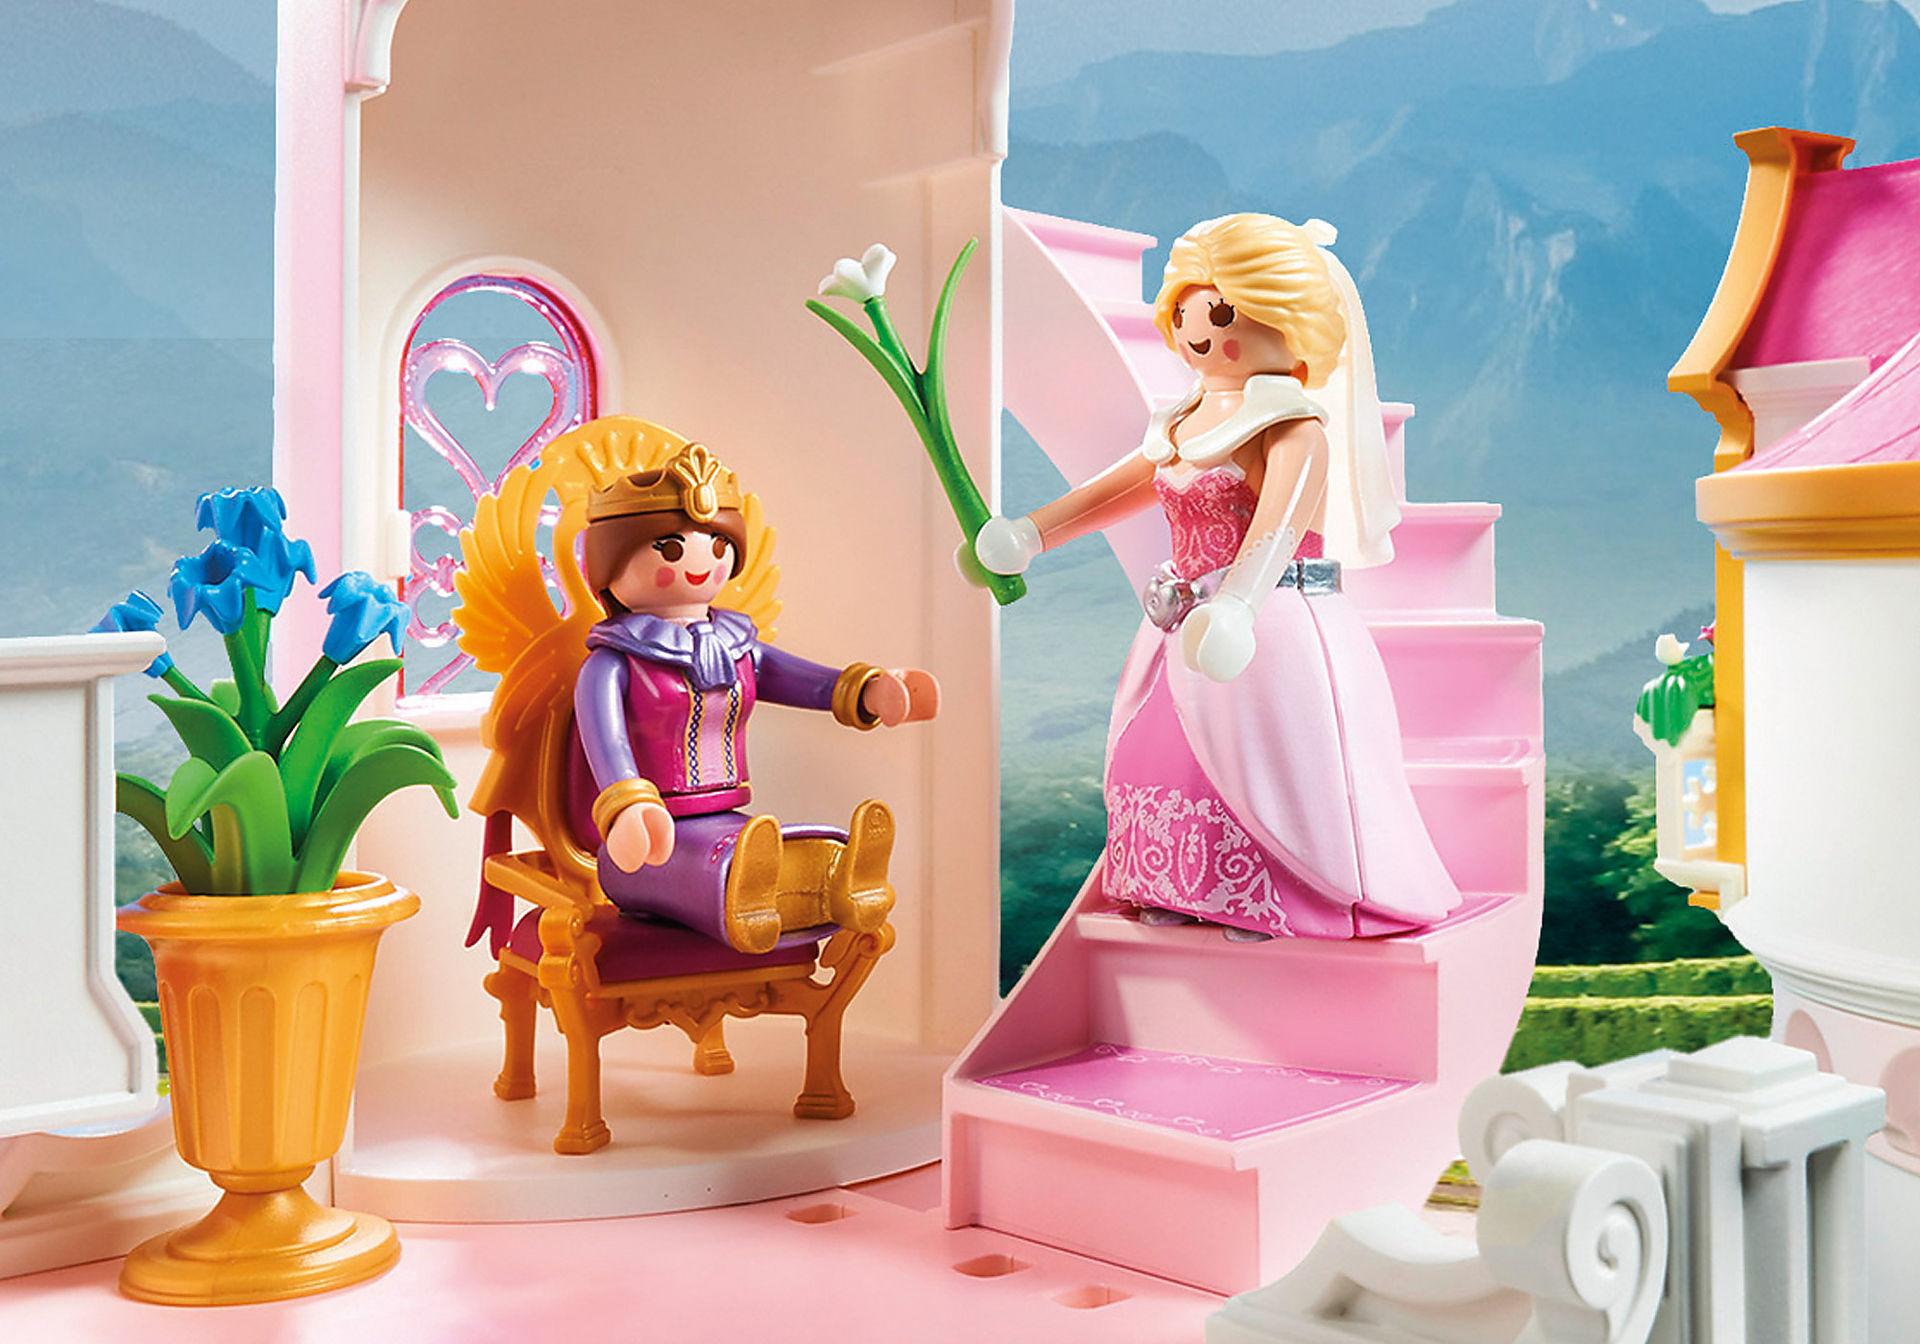 70447 Grande Castelo das Princesas zoom image7